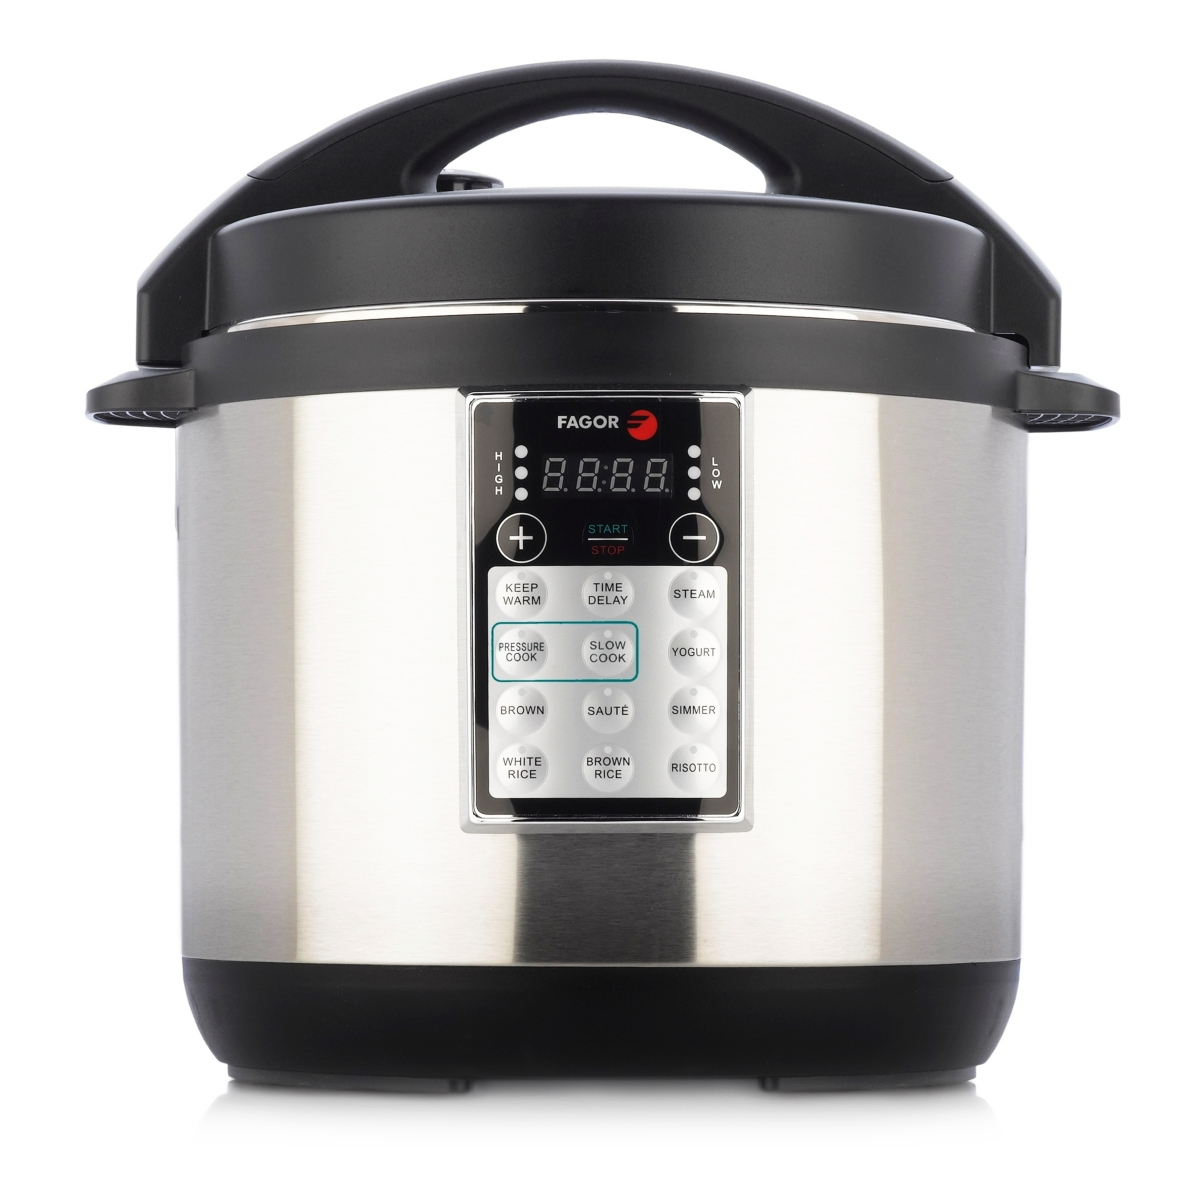 Fagor Lux Electric 8 Quart Multi Cooker